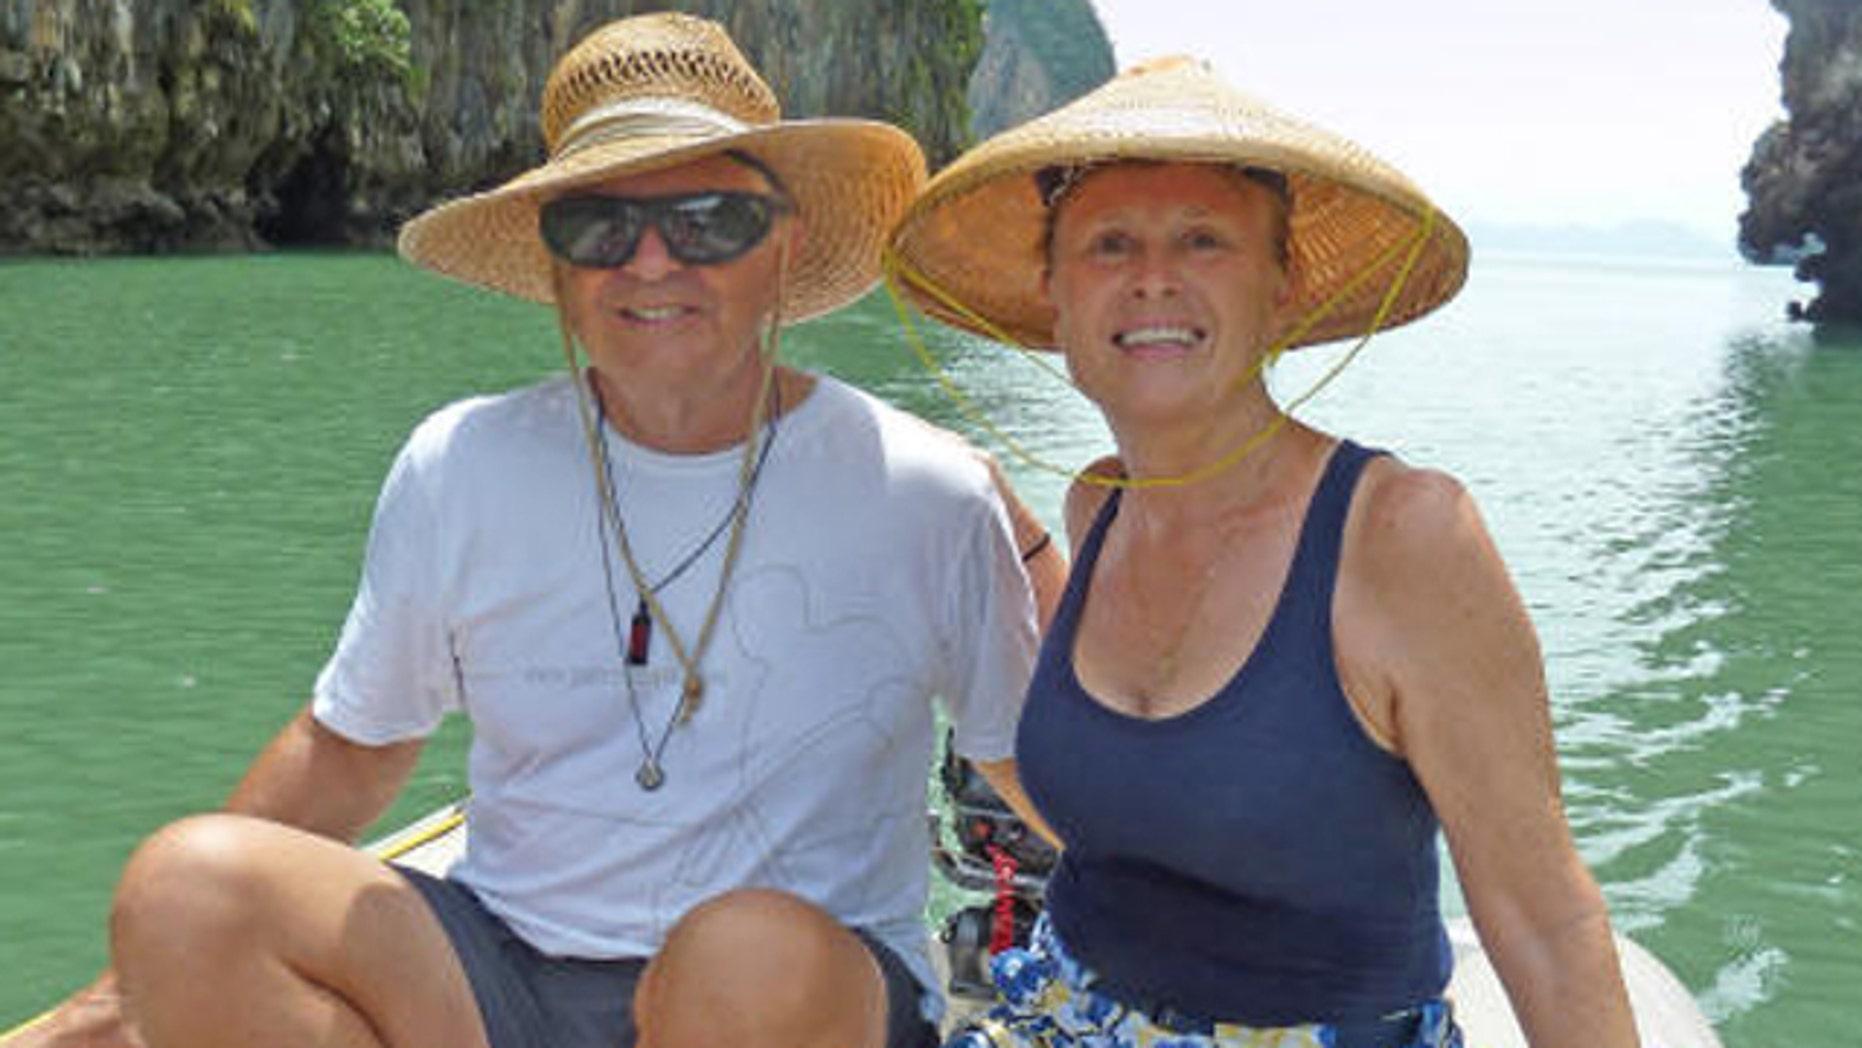 Undated photo shows Scott and Jean Adam.